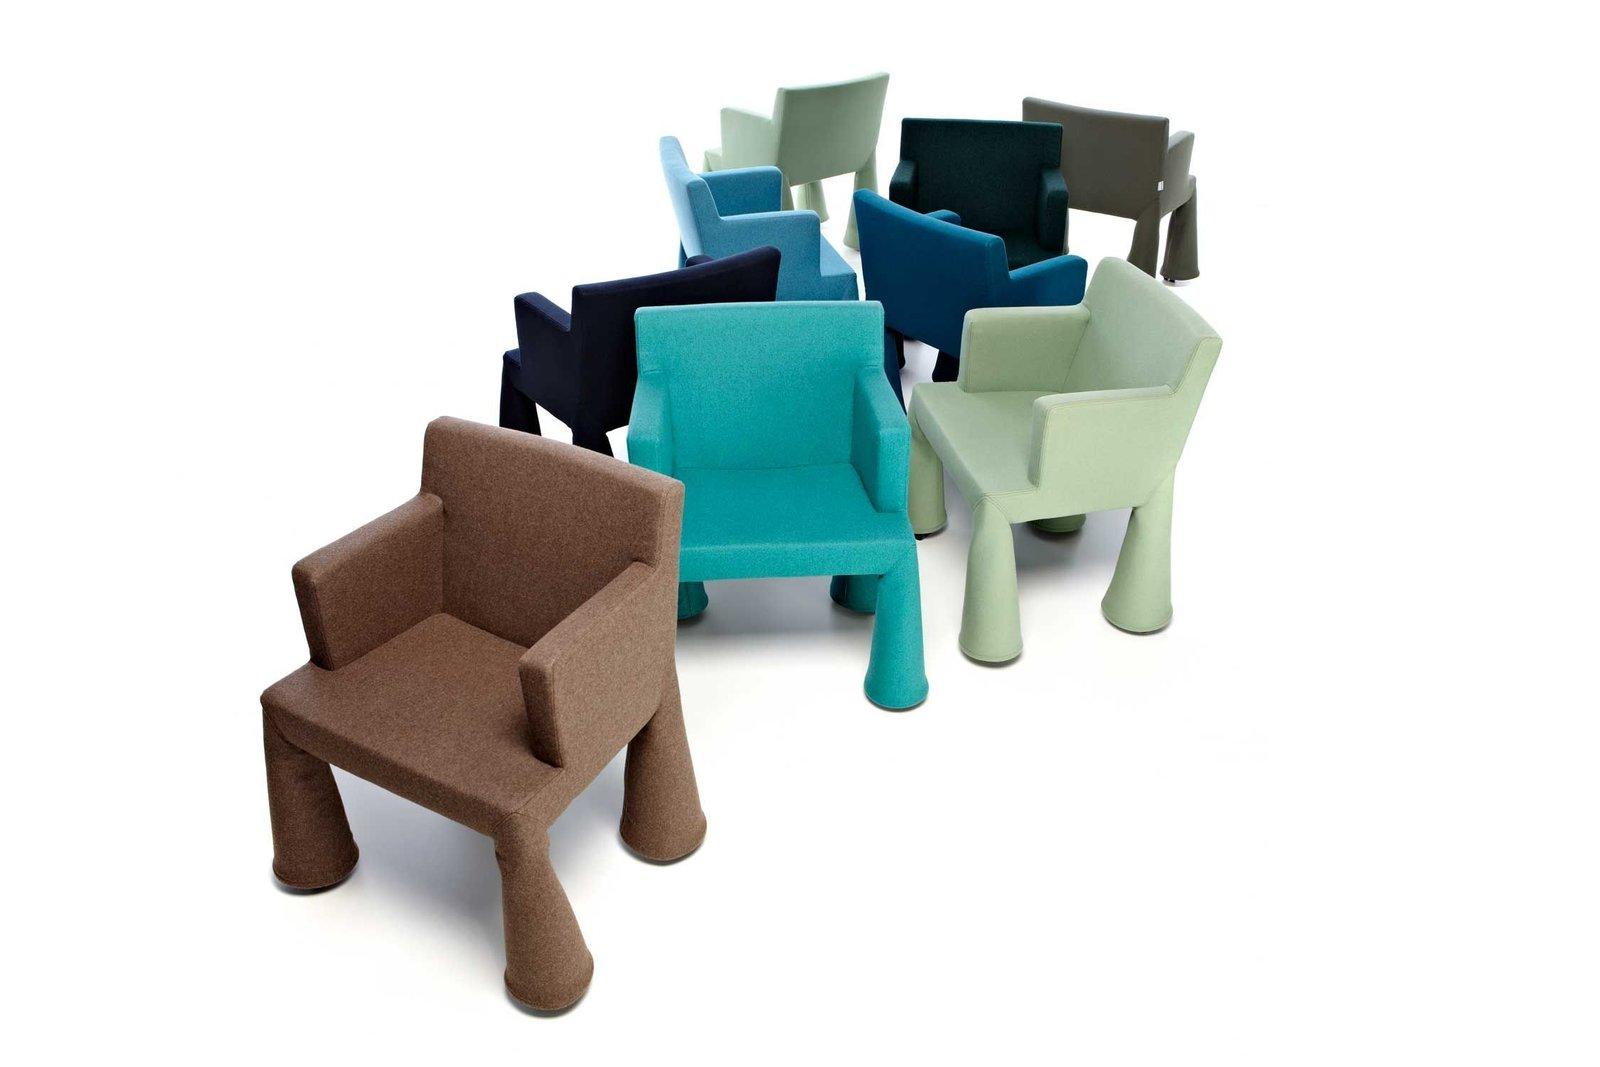 "V.I.P. Chair by Marcel Wanders  ∙ moooi  Search ""동해출장마사지-출장안마-출장-출장서비스 동해콜걸 출장샵 주소ㅋr톡BC388 주소[sannhu222,vip] 동해 출장여대생 만남 출장만남 업소 타이마사지 출장샵추천 업소  동해출장샵 출장서비스 출장업소"" from Seaters"